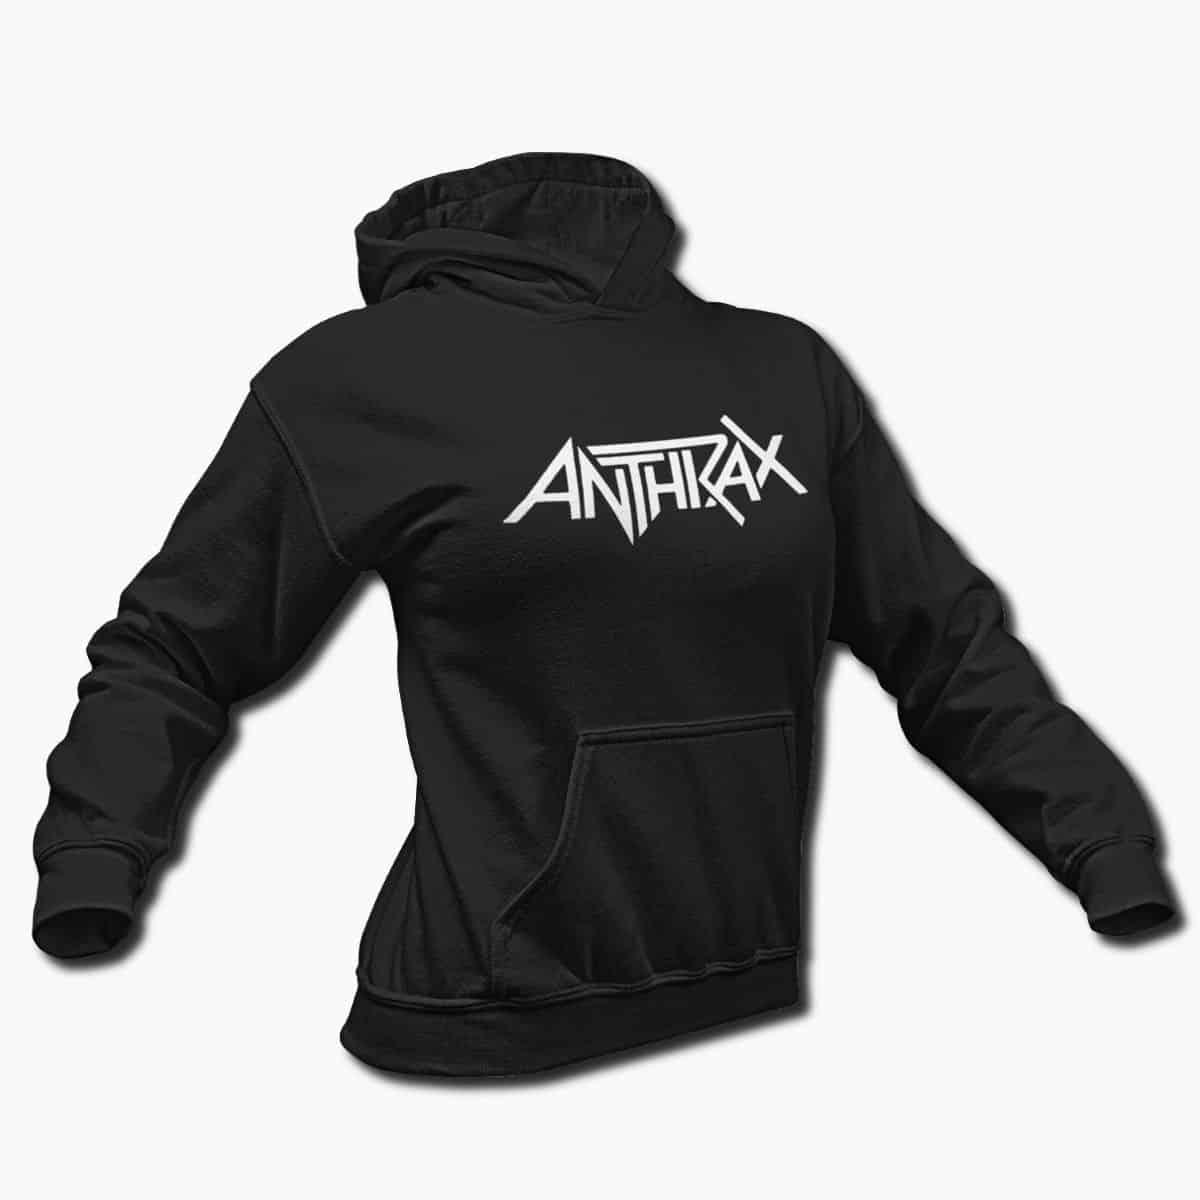 Speed thrash metal bands